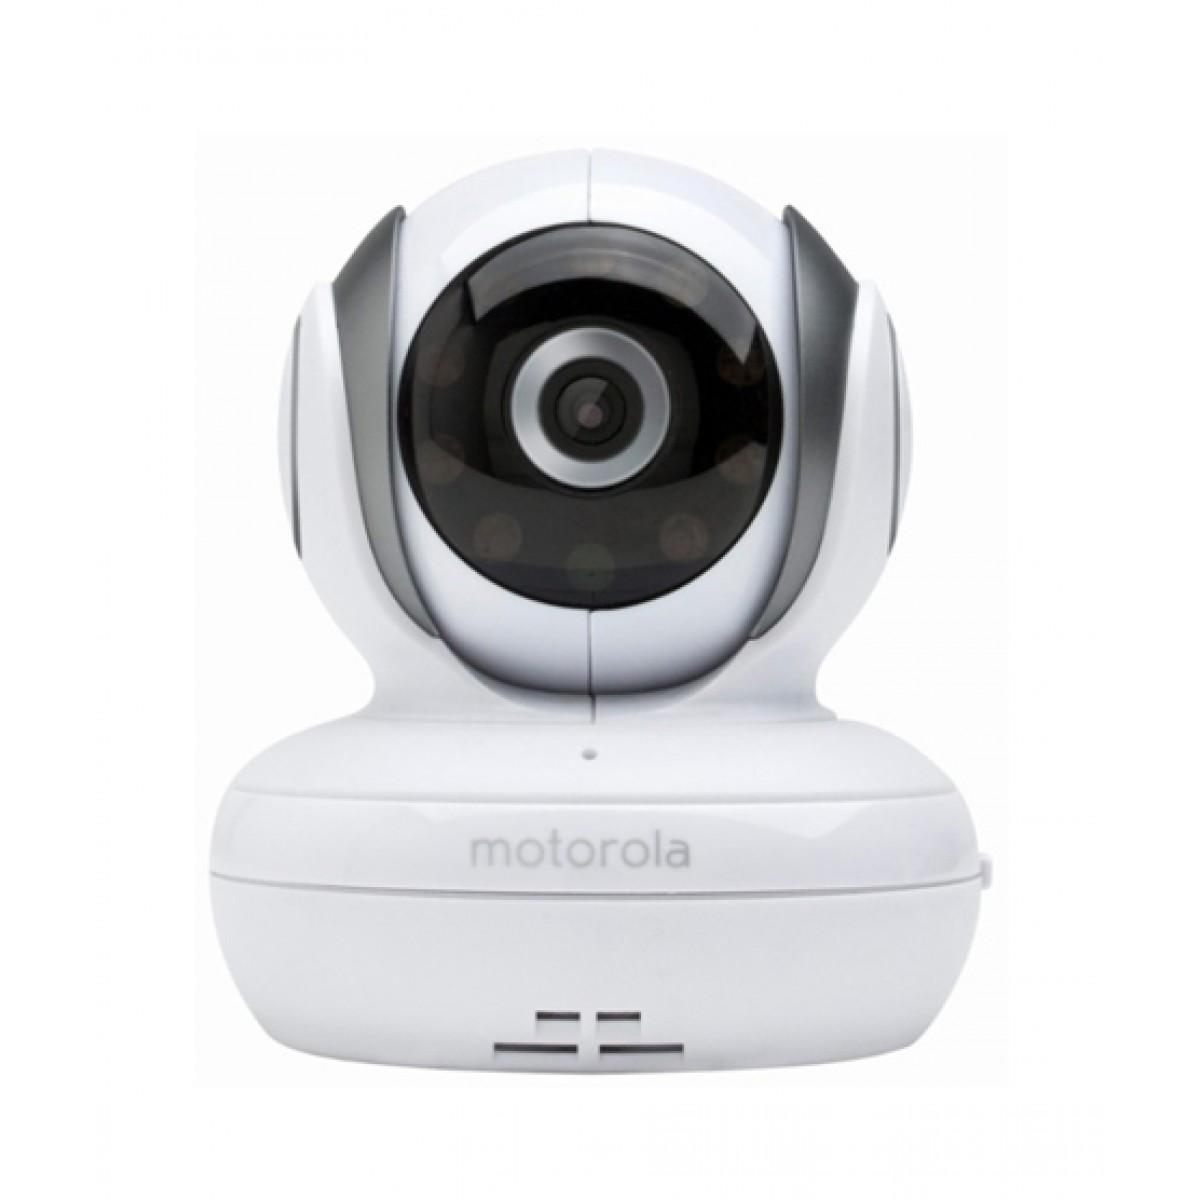 Motorola Add On Wireless Camera White (MOTO-MBP36SBU)